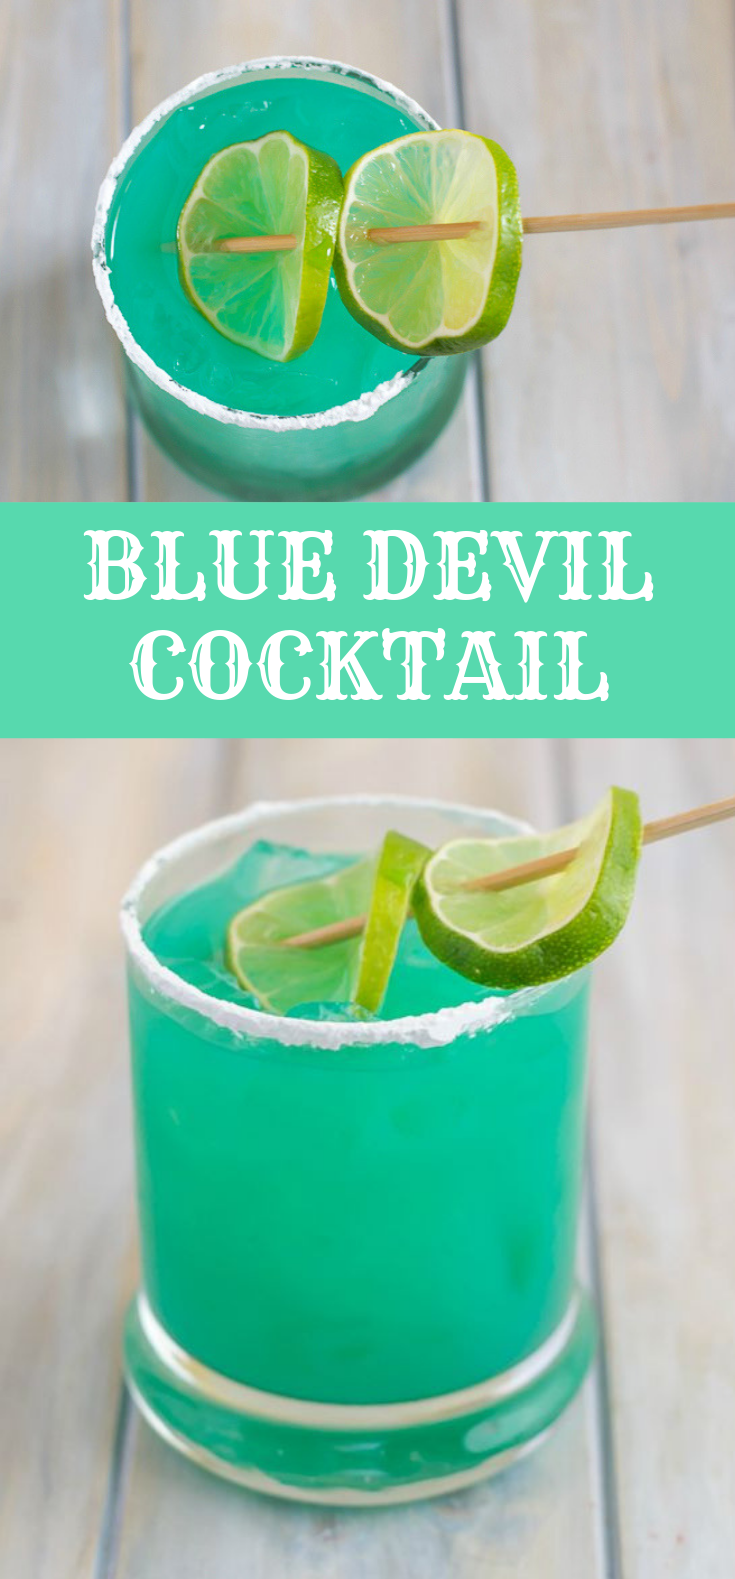 BLUE DEVIL COCKTAIL RECIPE #Cocktail #Drinks #cocktaildrinks